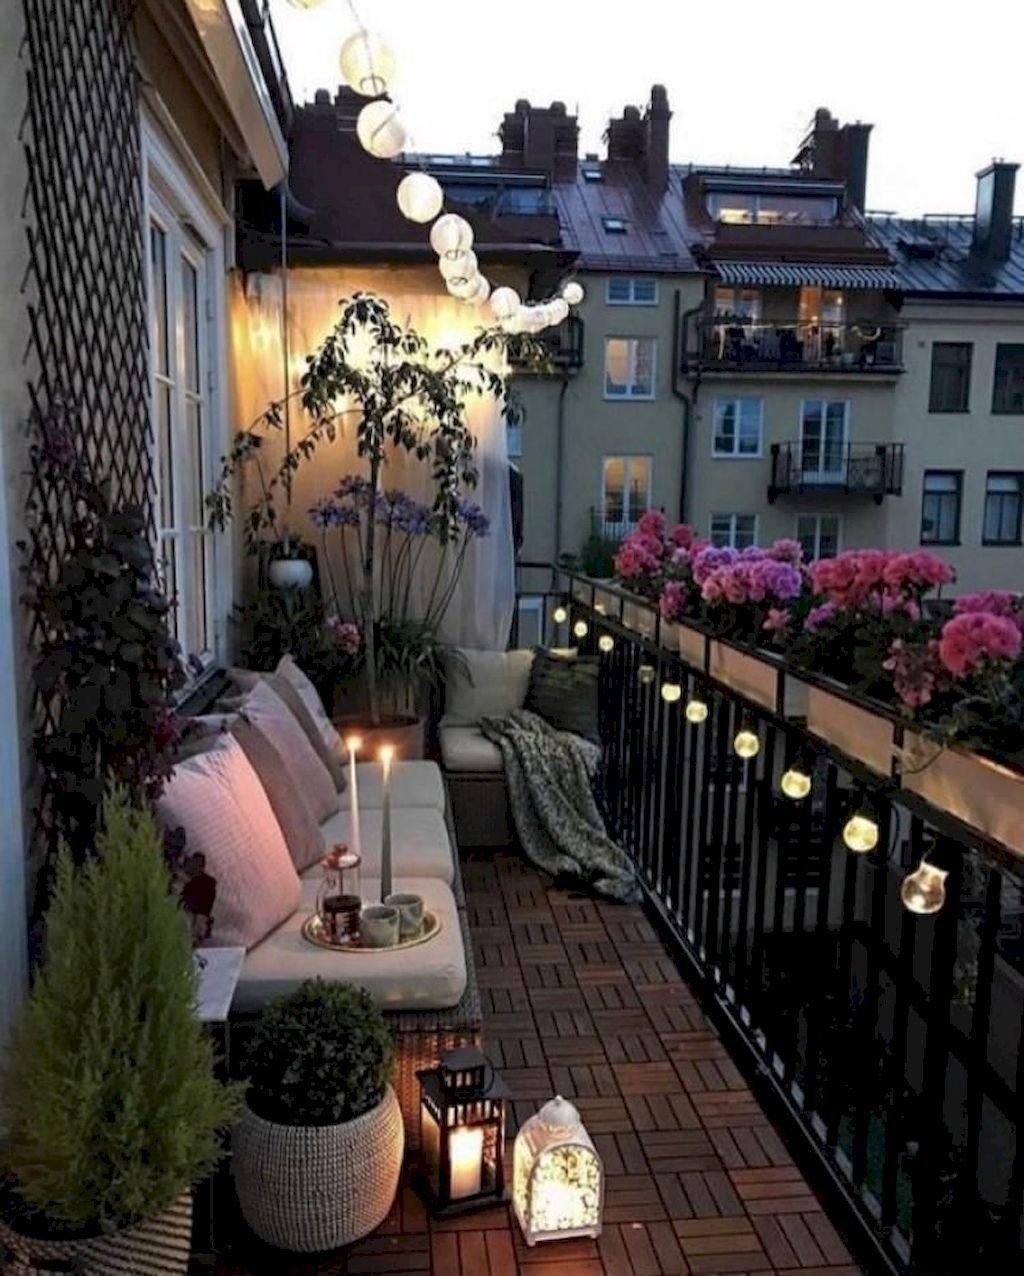 63 Cozy Apartment Balcony Decorating Ideas: 65 Cozy Apartment Balcony Decorating Ideas